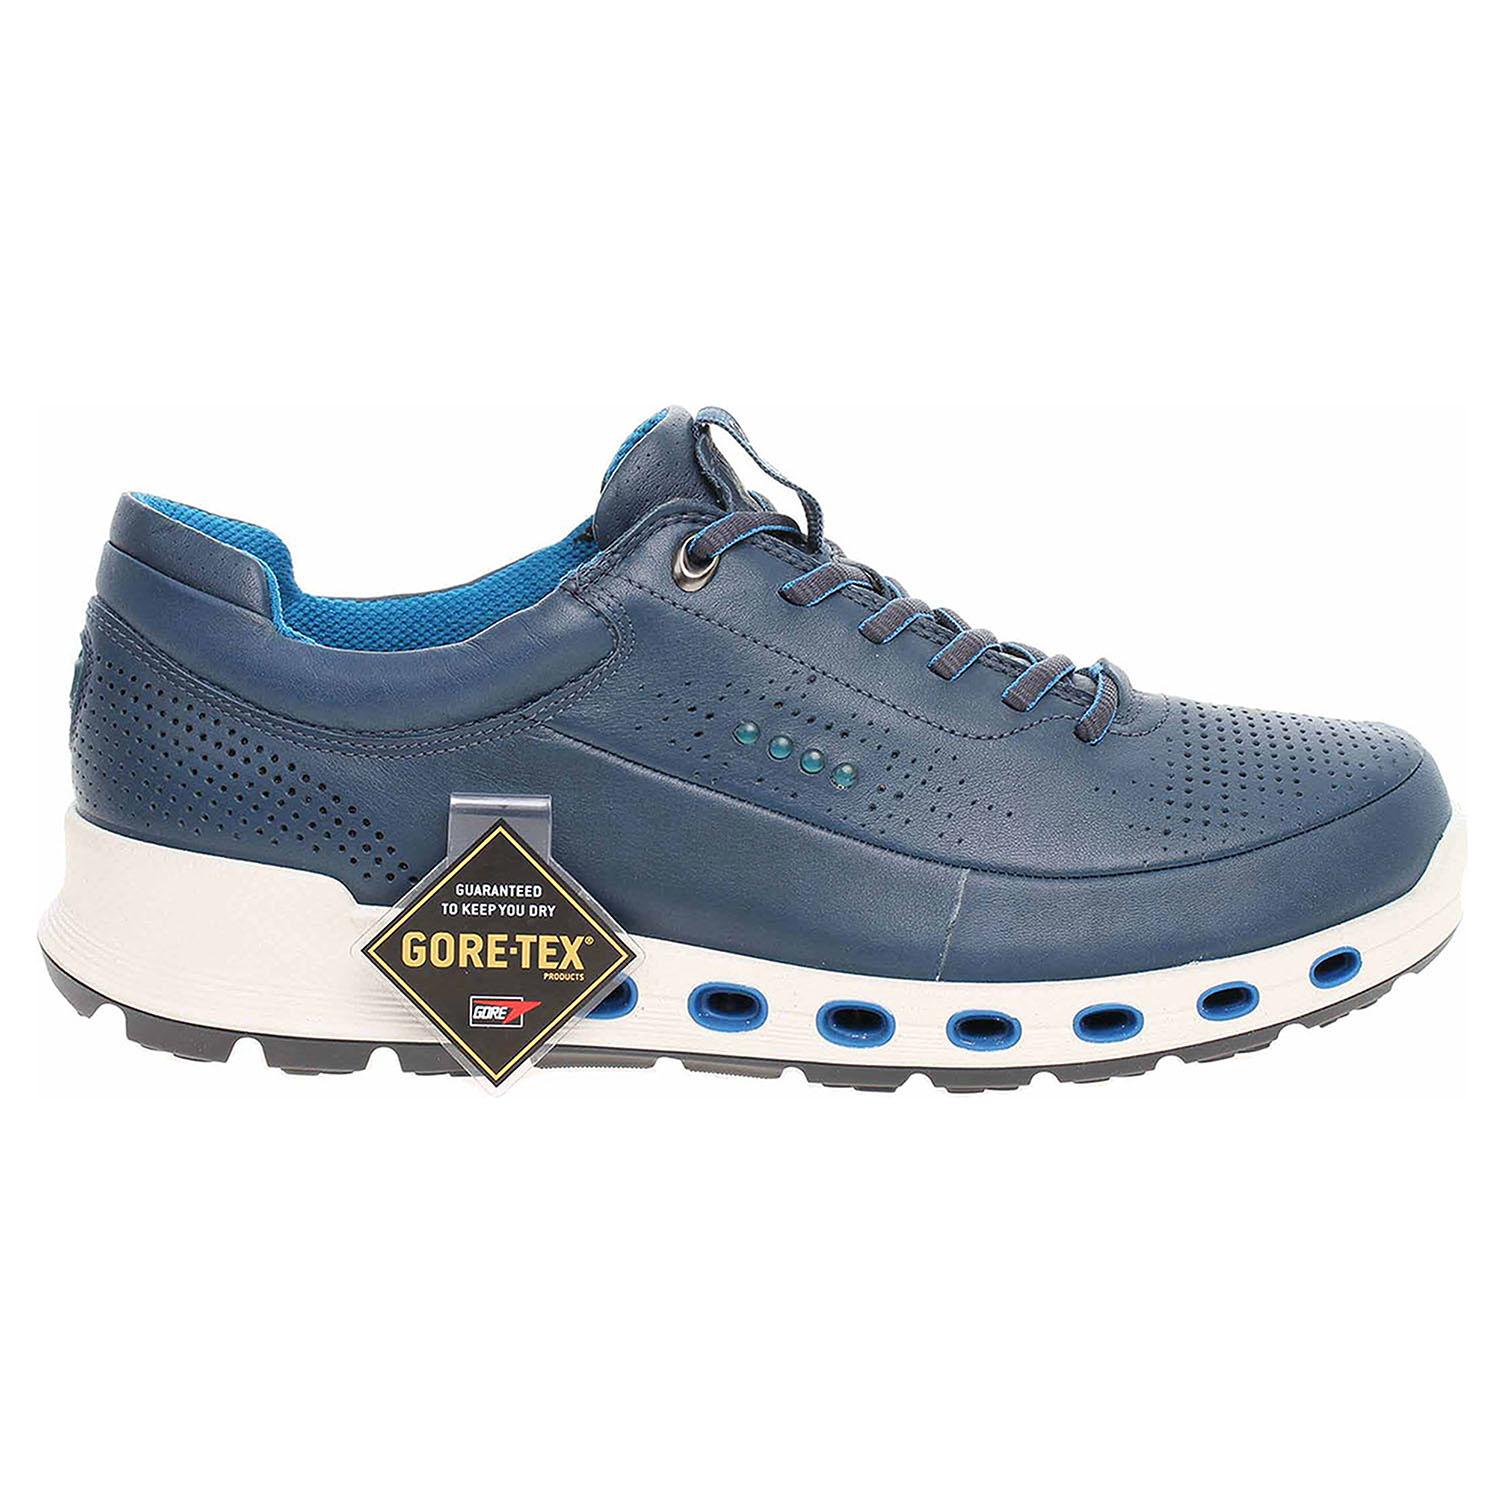 Ecco Ecco Cool 2.0 pánská obuv 84251401048 true navy 24000412